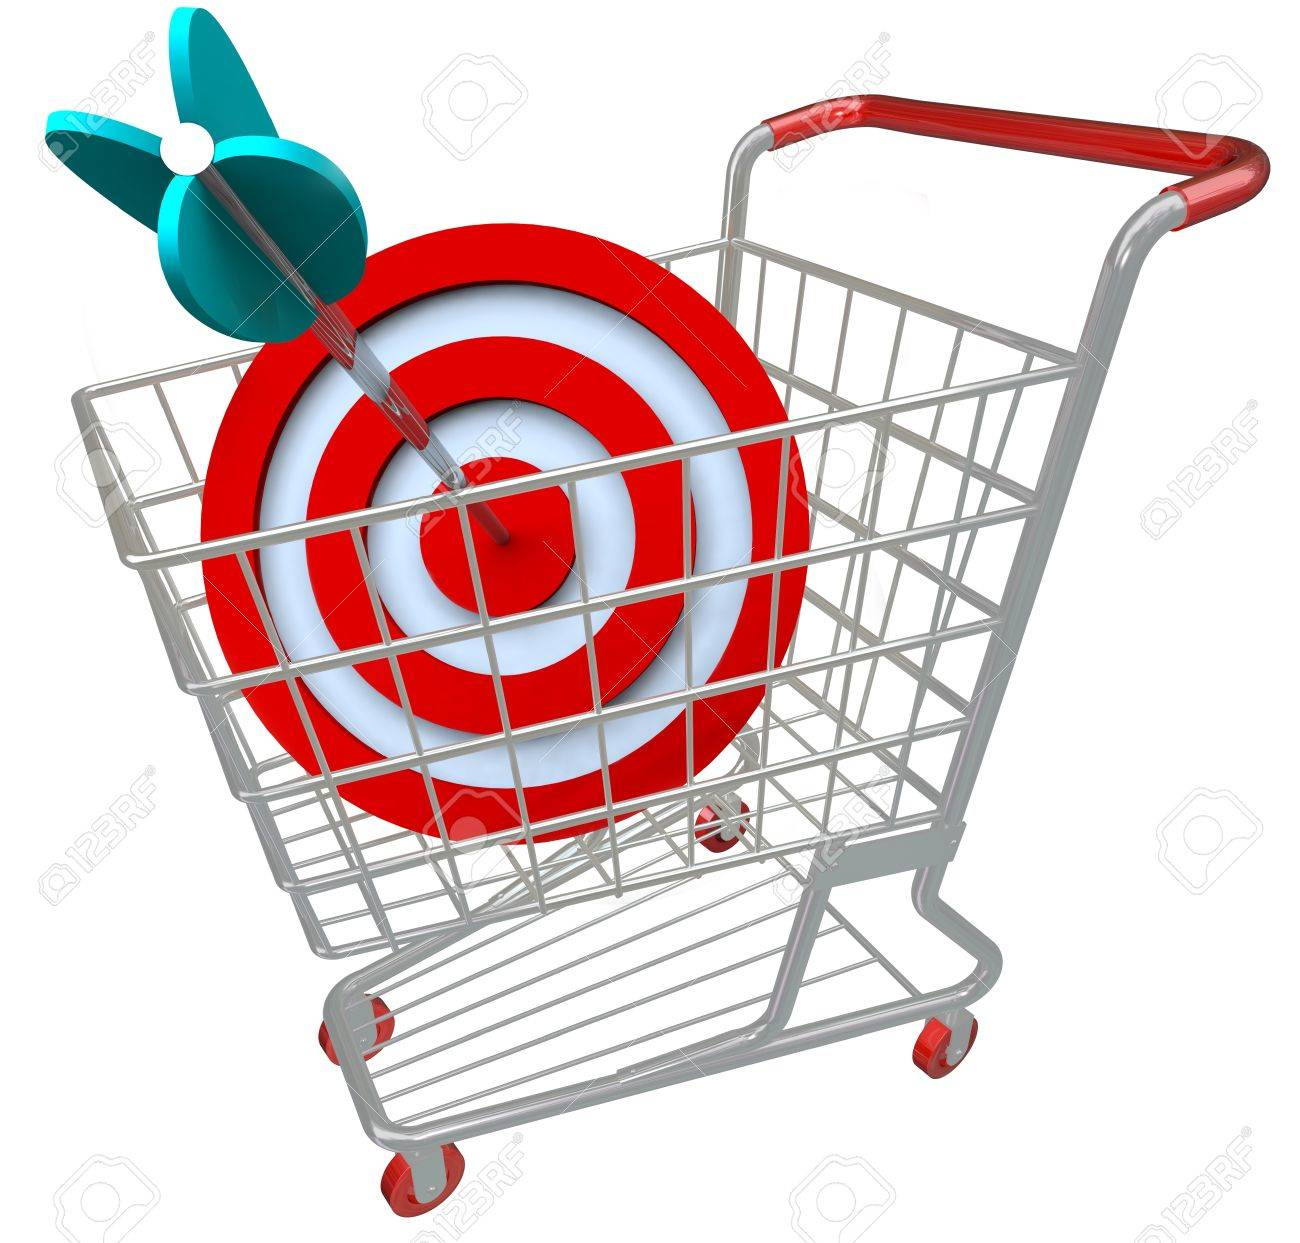 Target Symbol Target Symbol a Shopping Cart